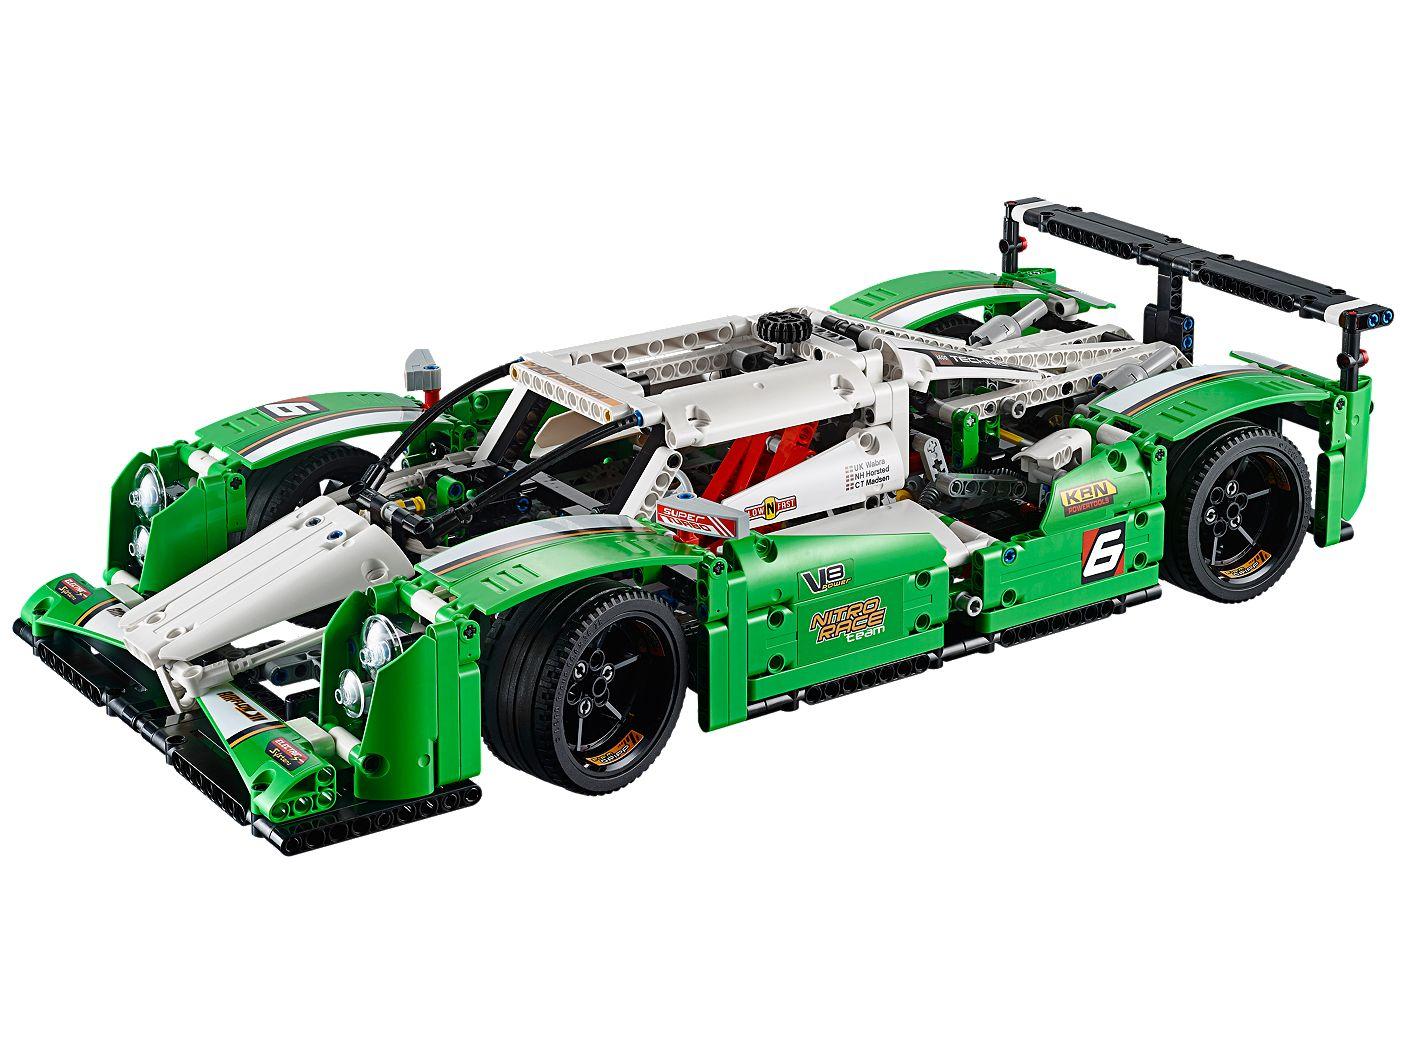 24 Hours Race Car